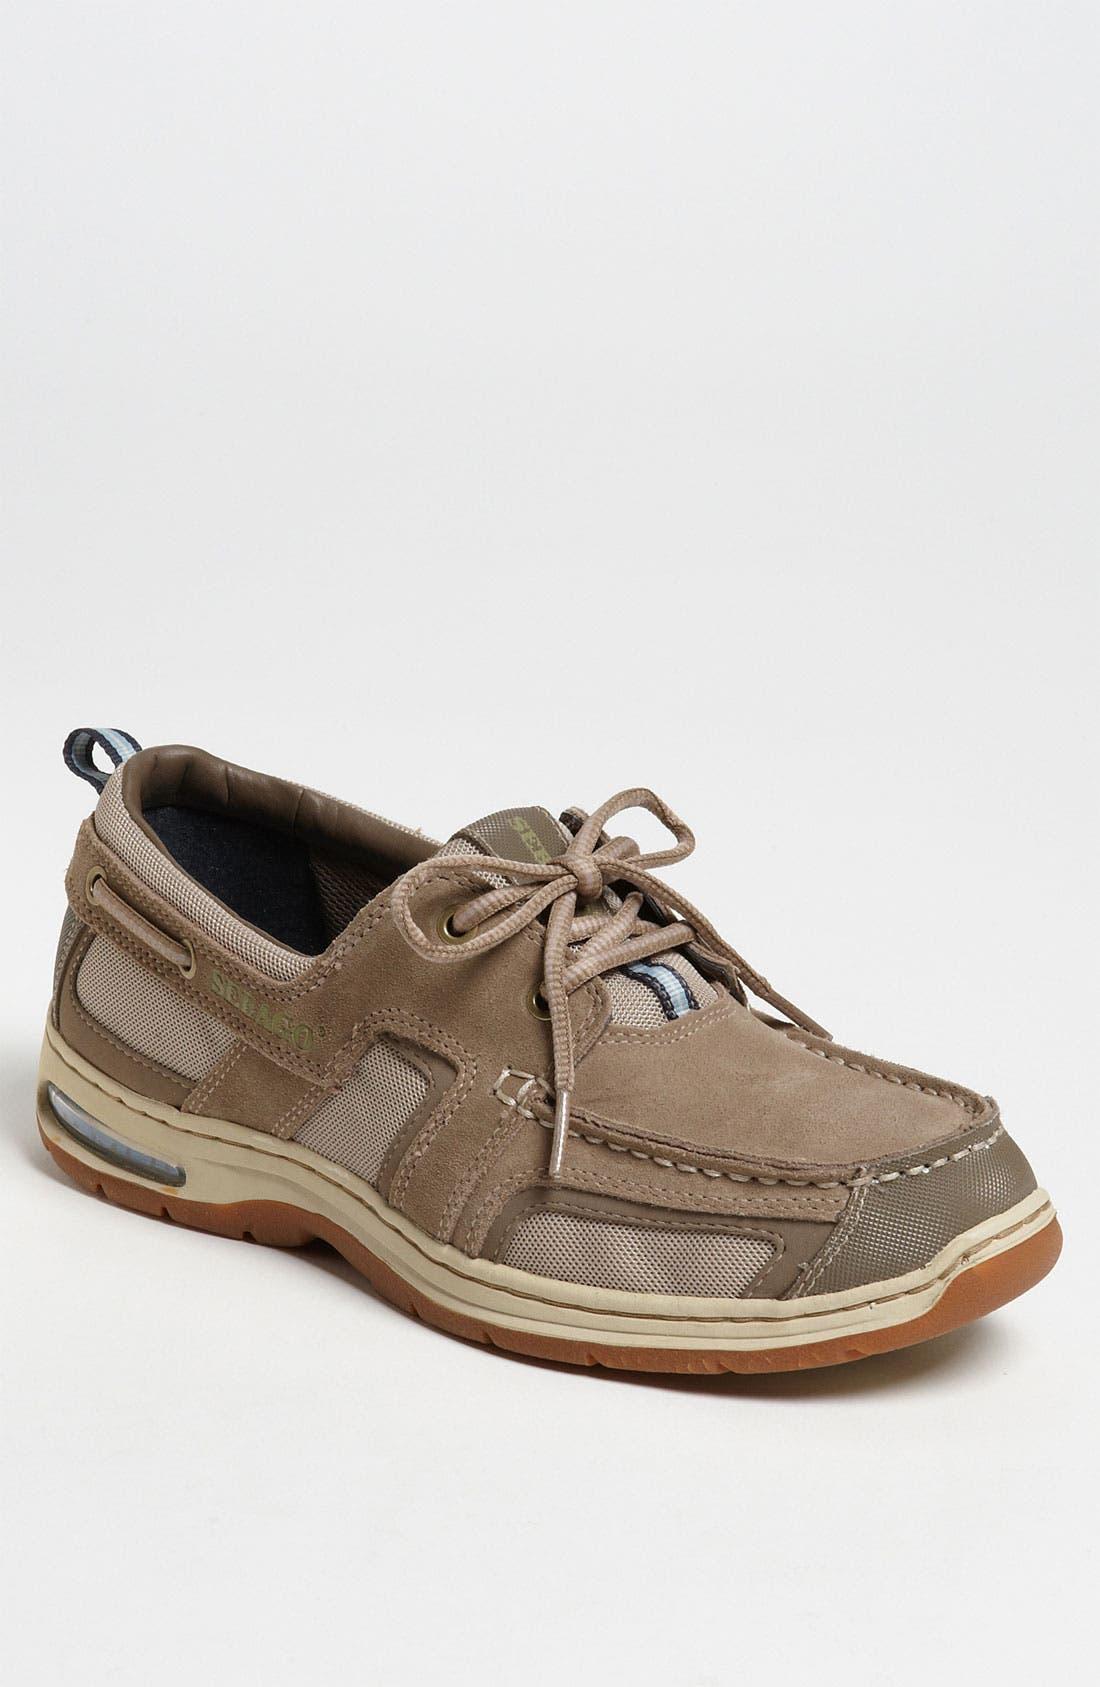 Main Image - Sebago 'Offshore Catch' Boat Shoe